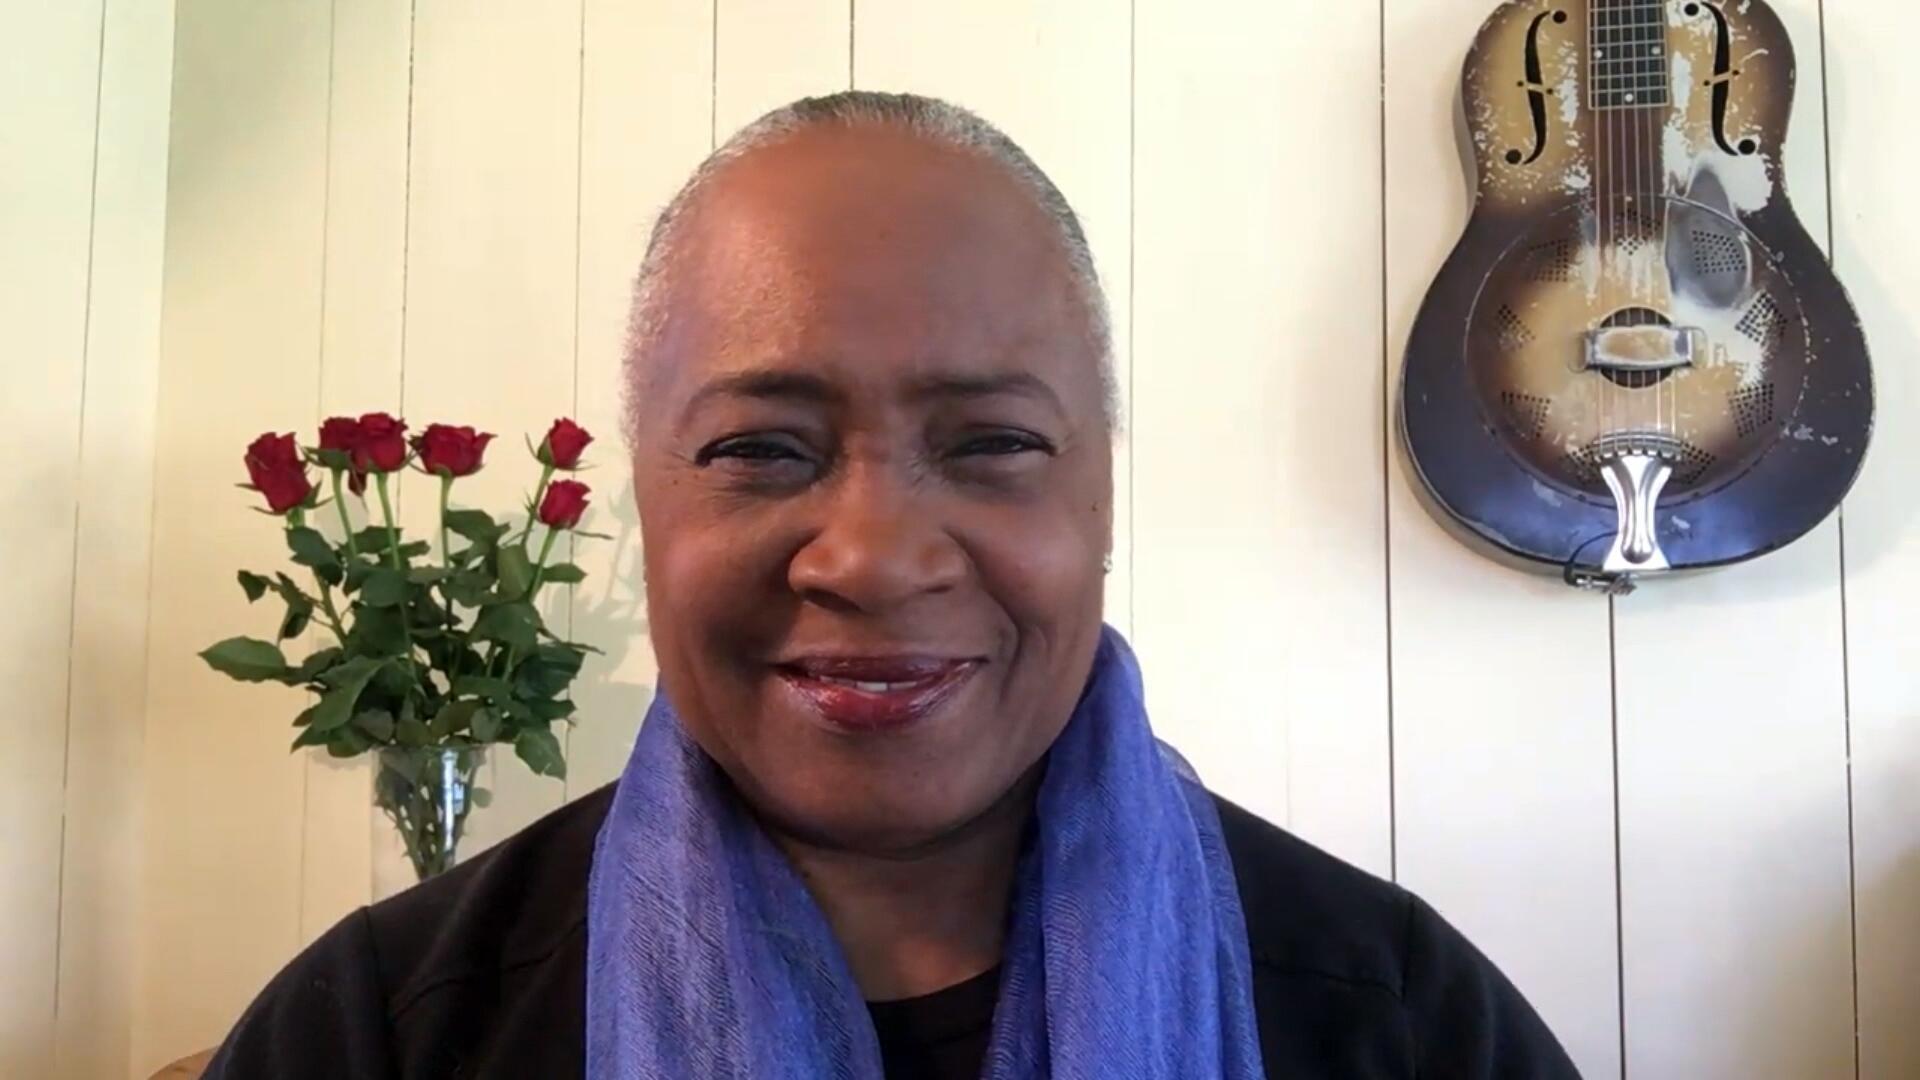 Barbara Hendricks, cantatrice et ambassadrice de bonne volonté du HCR